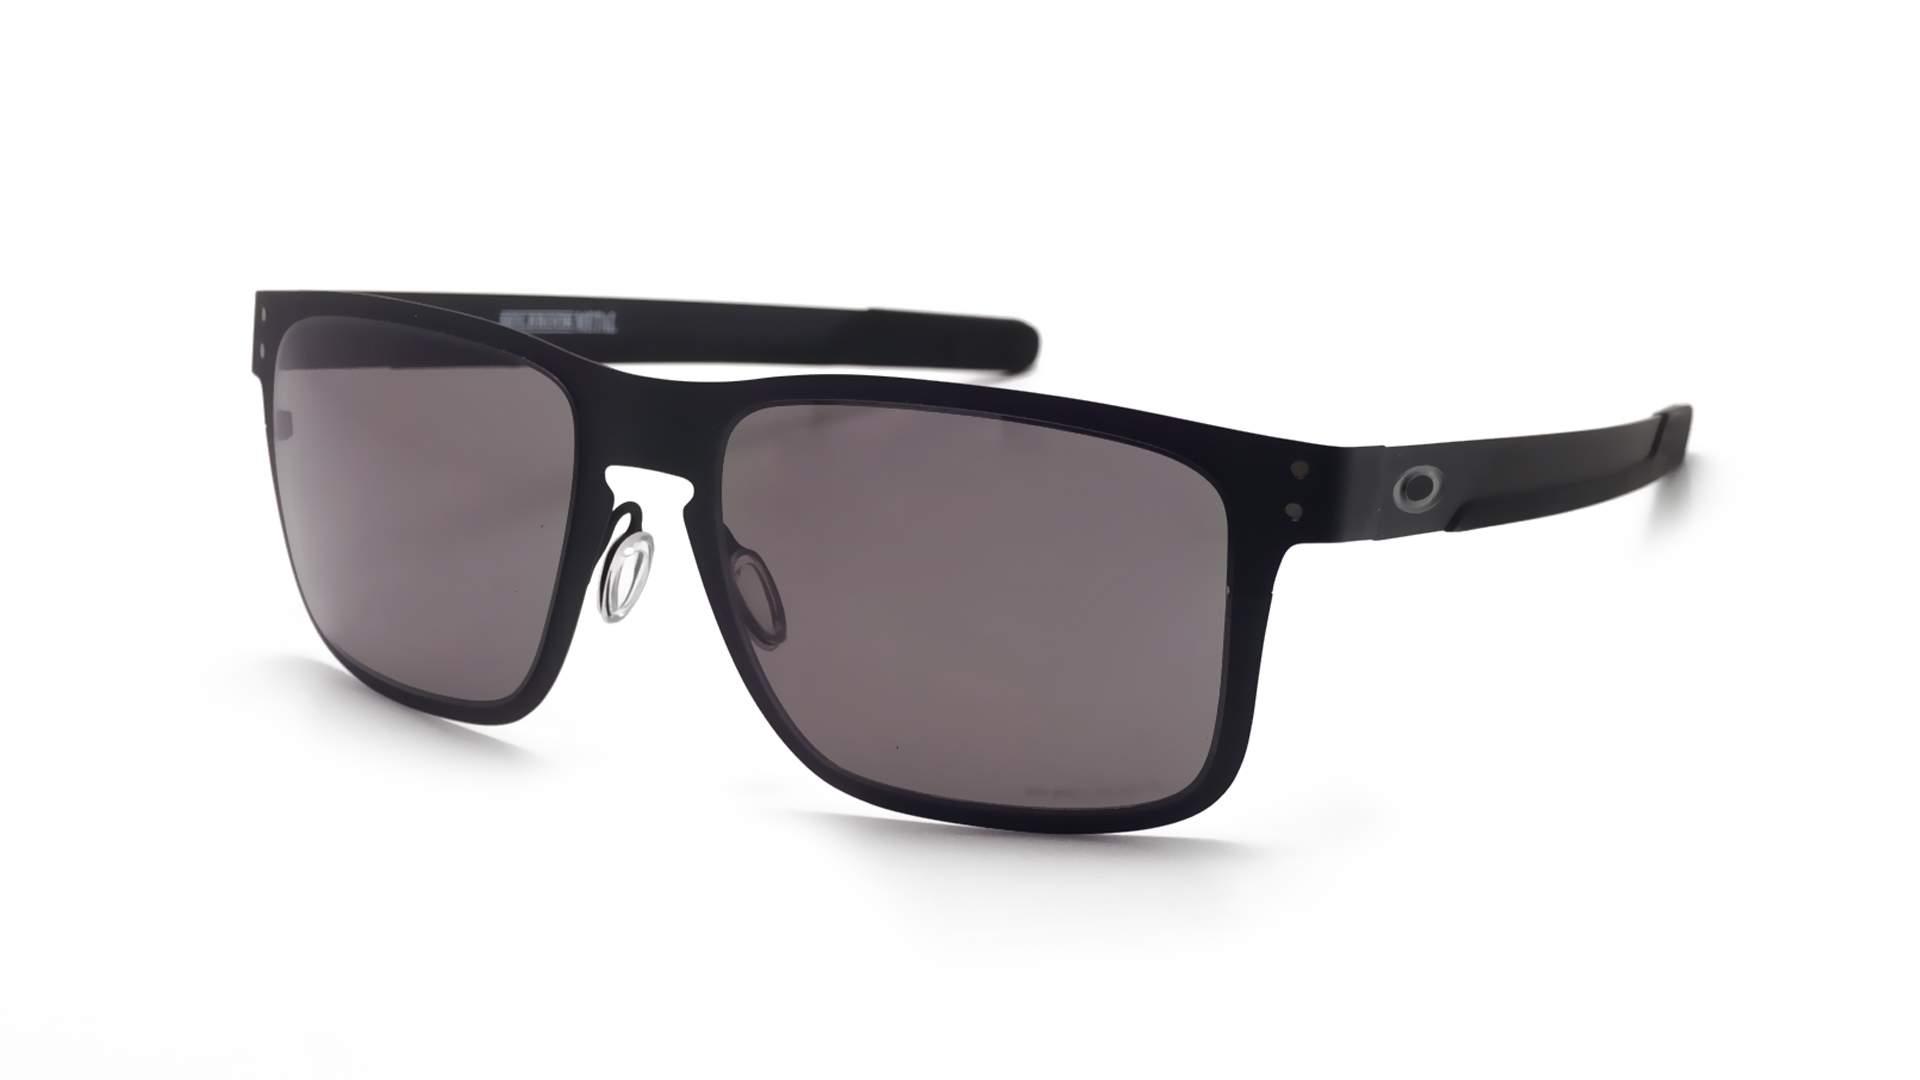 08a440e12796d Sunglasses Oakley Holbrook Metal Black Matte Prizm OO4123 11 55-18 Medium